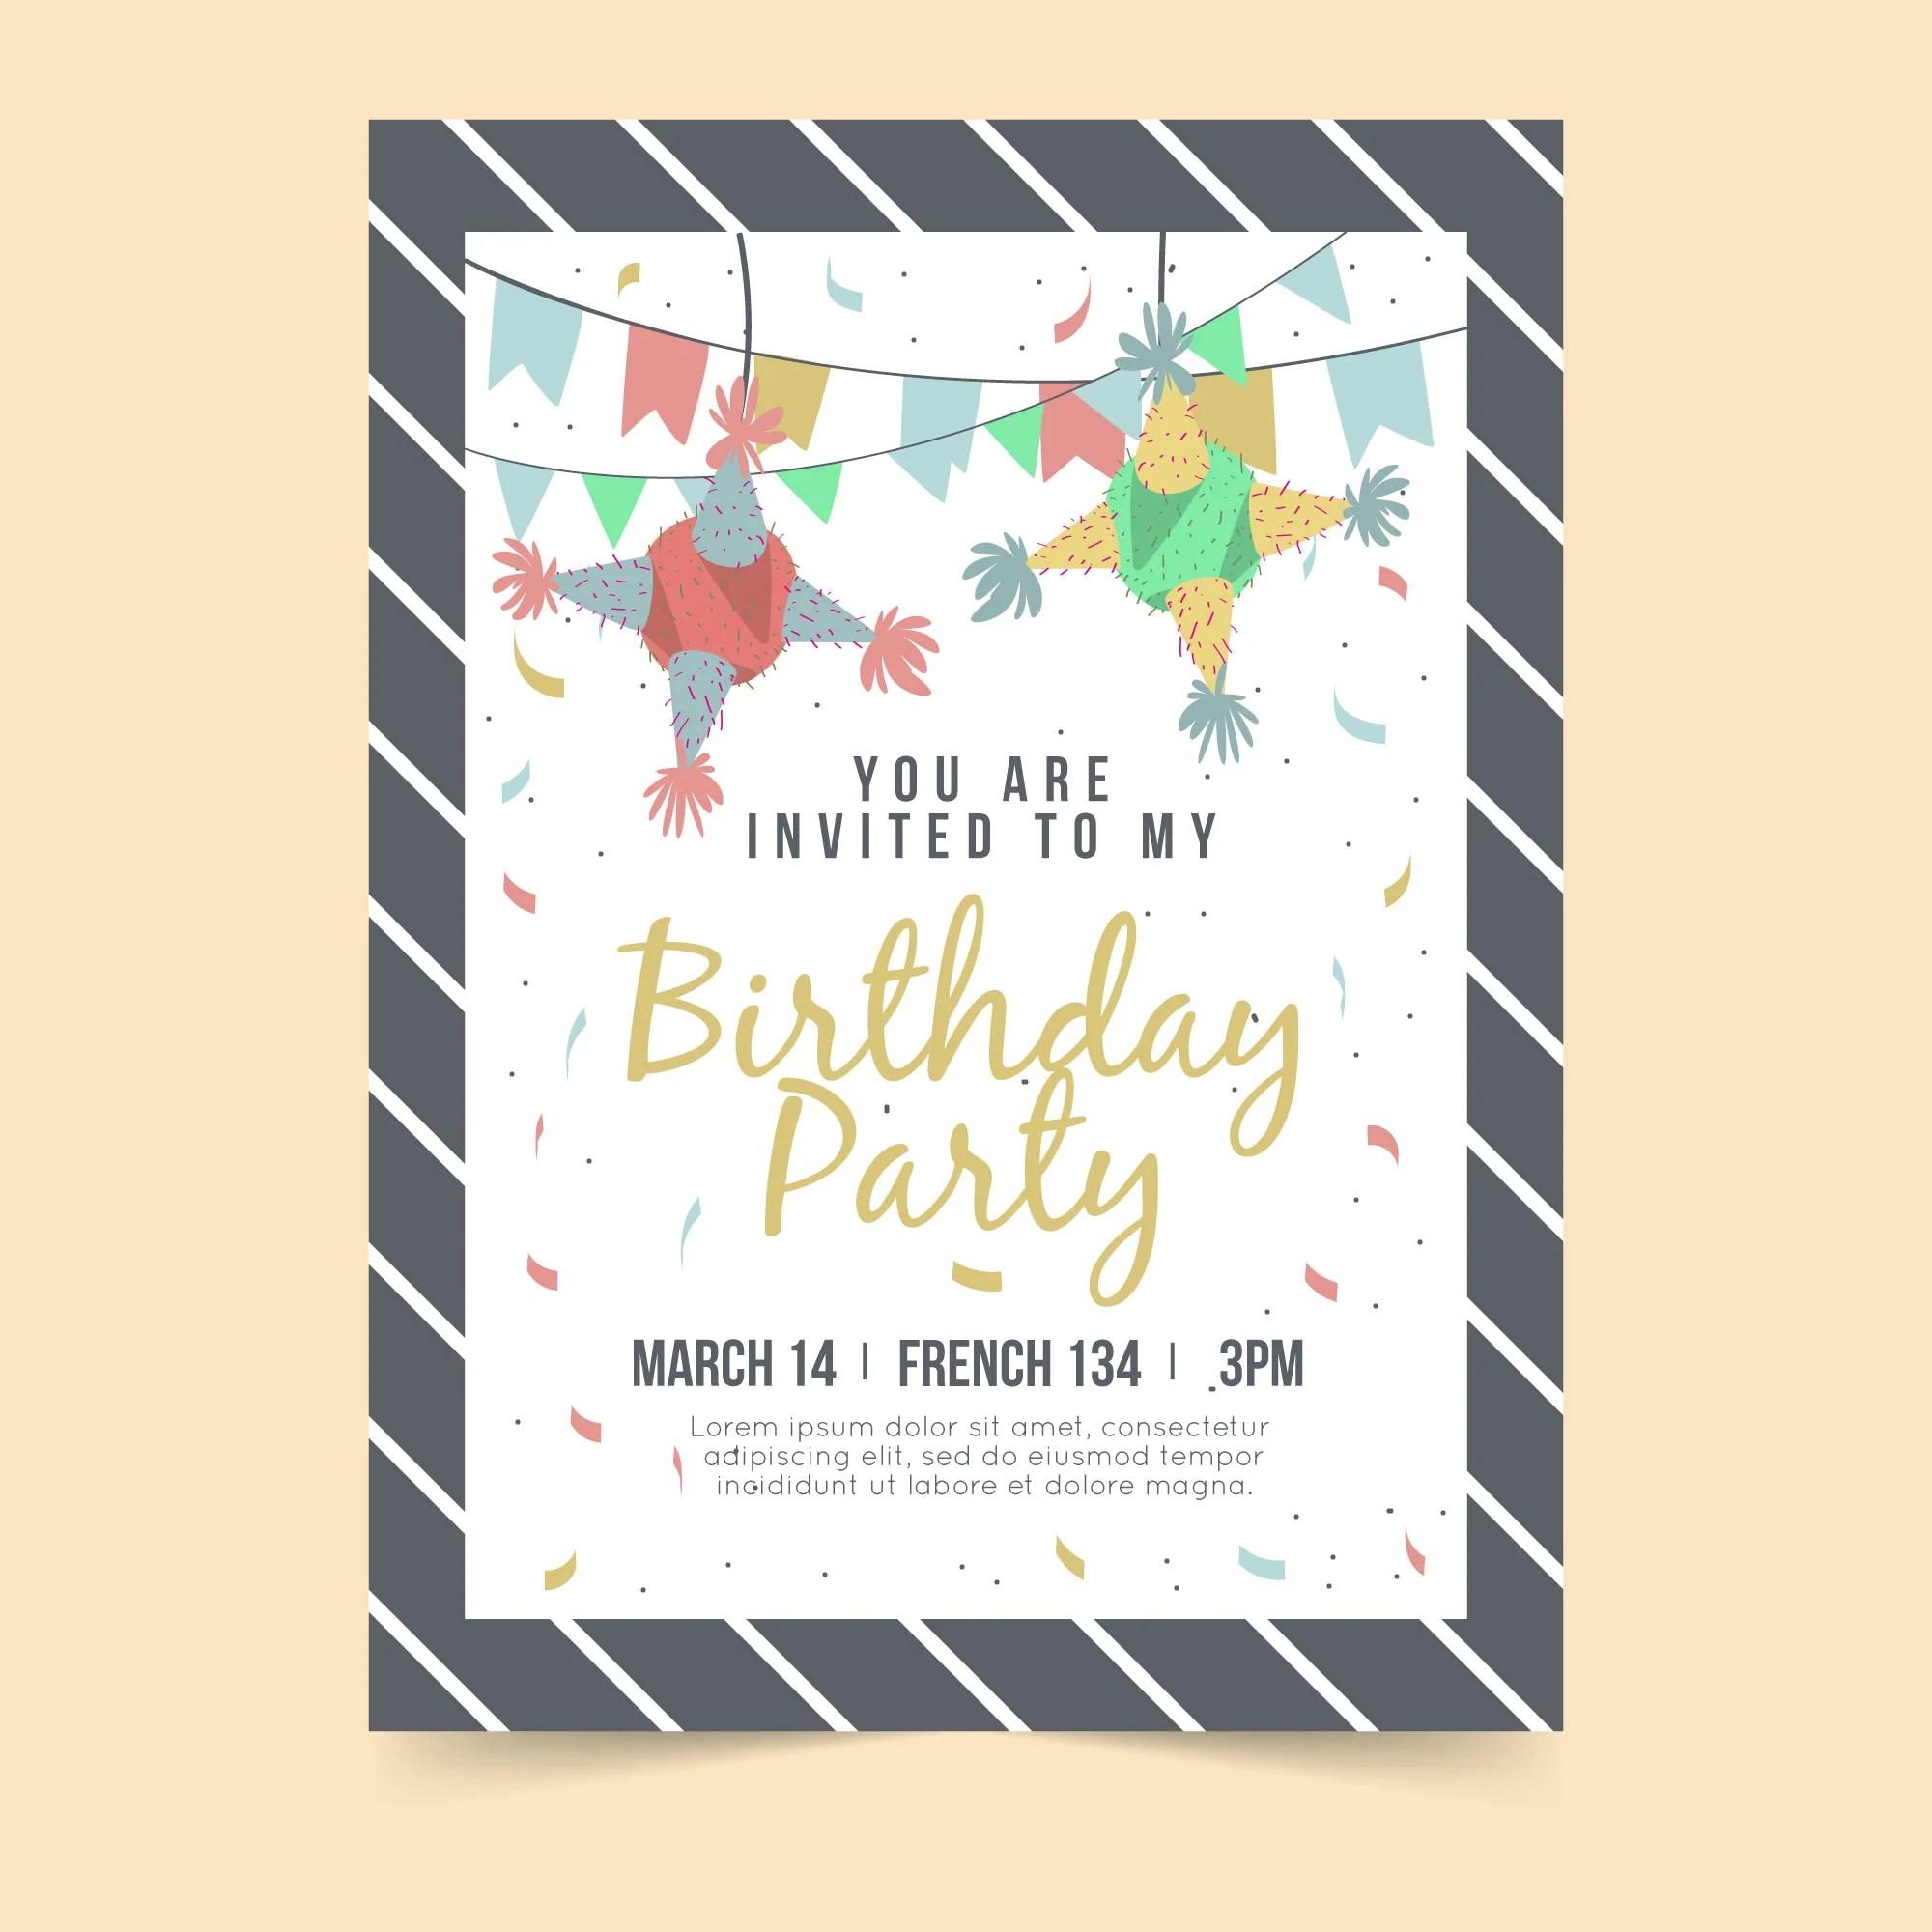 simple yet elegant birthday party invitation card set of 25 pcs